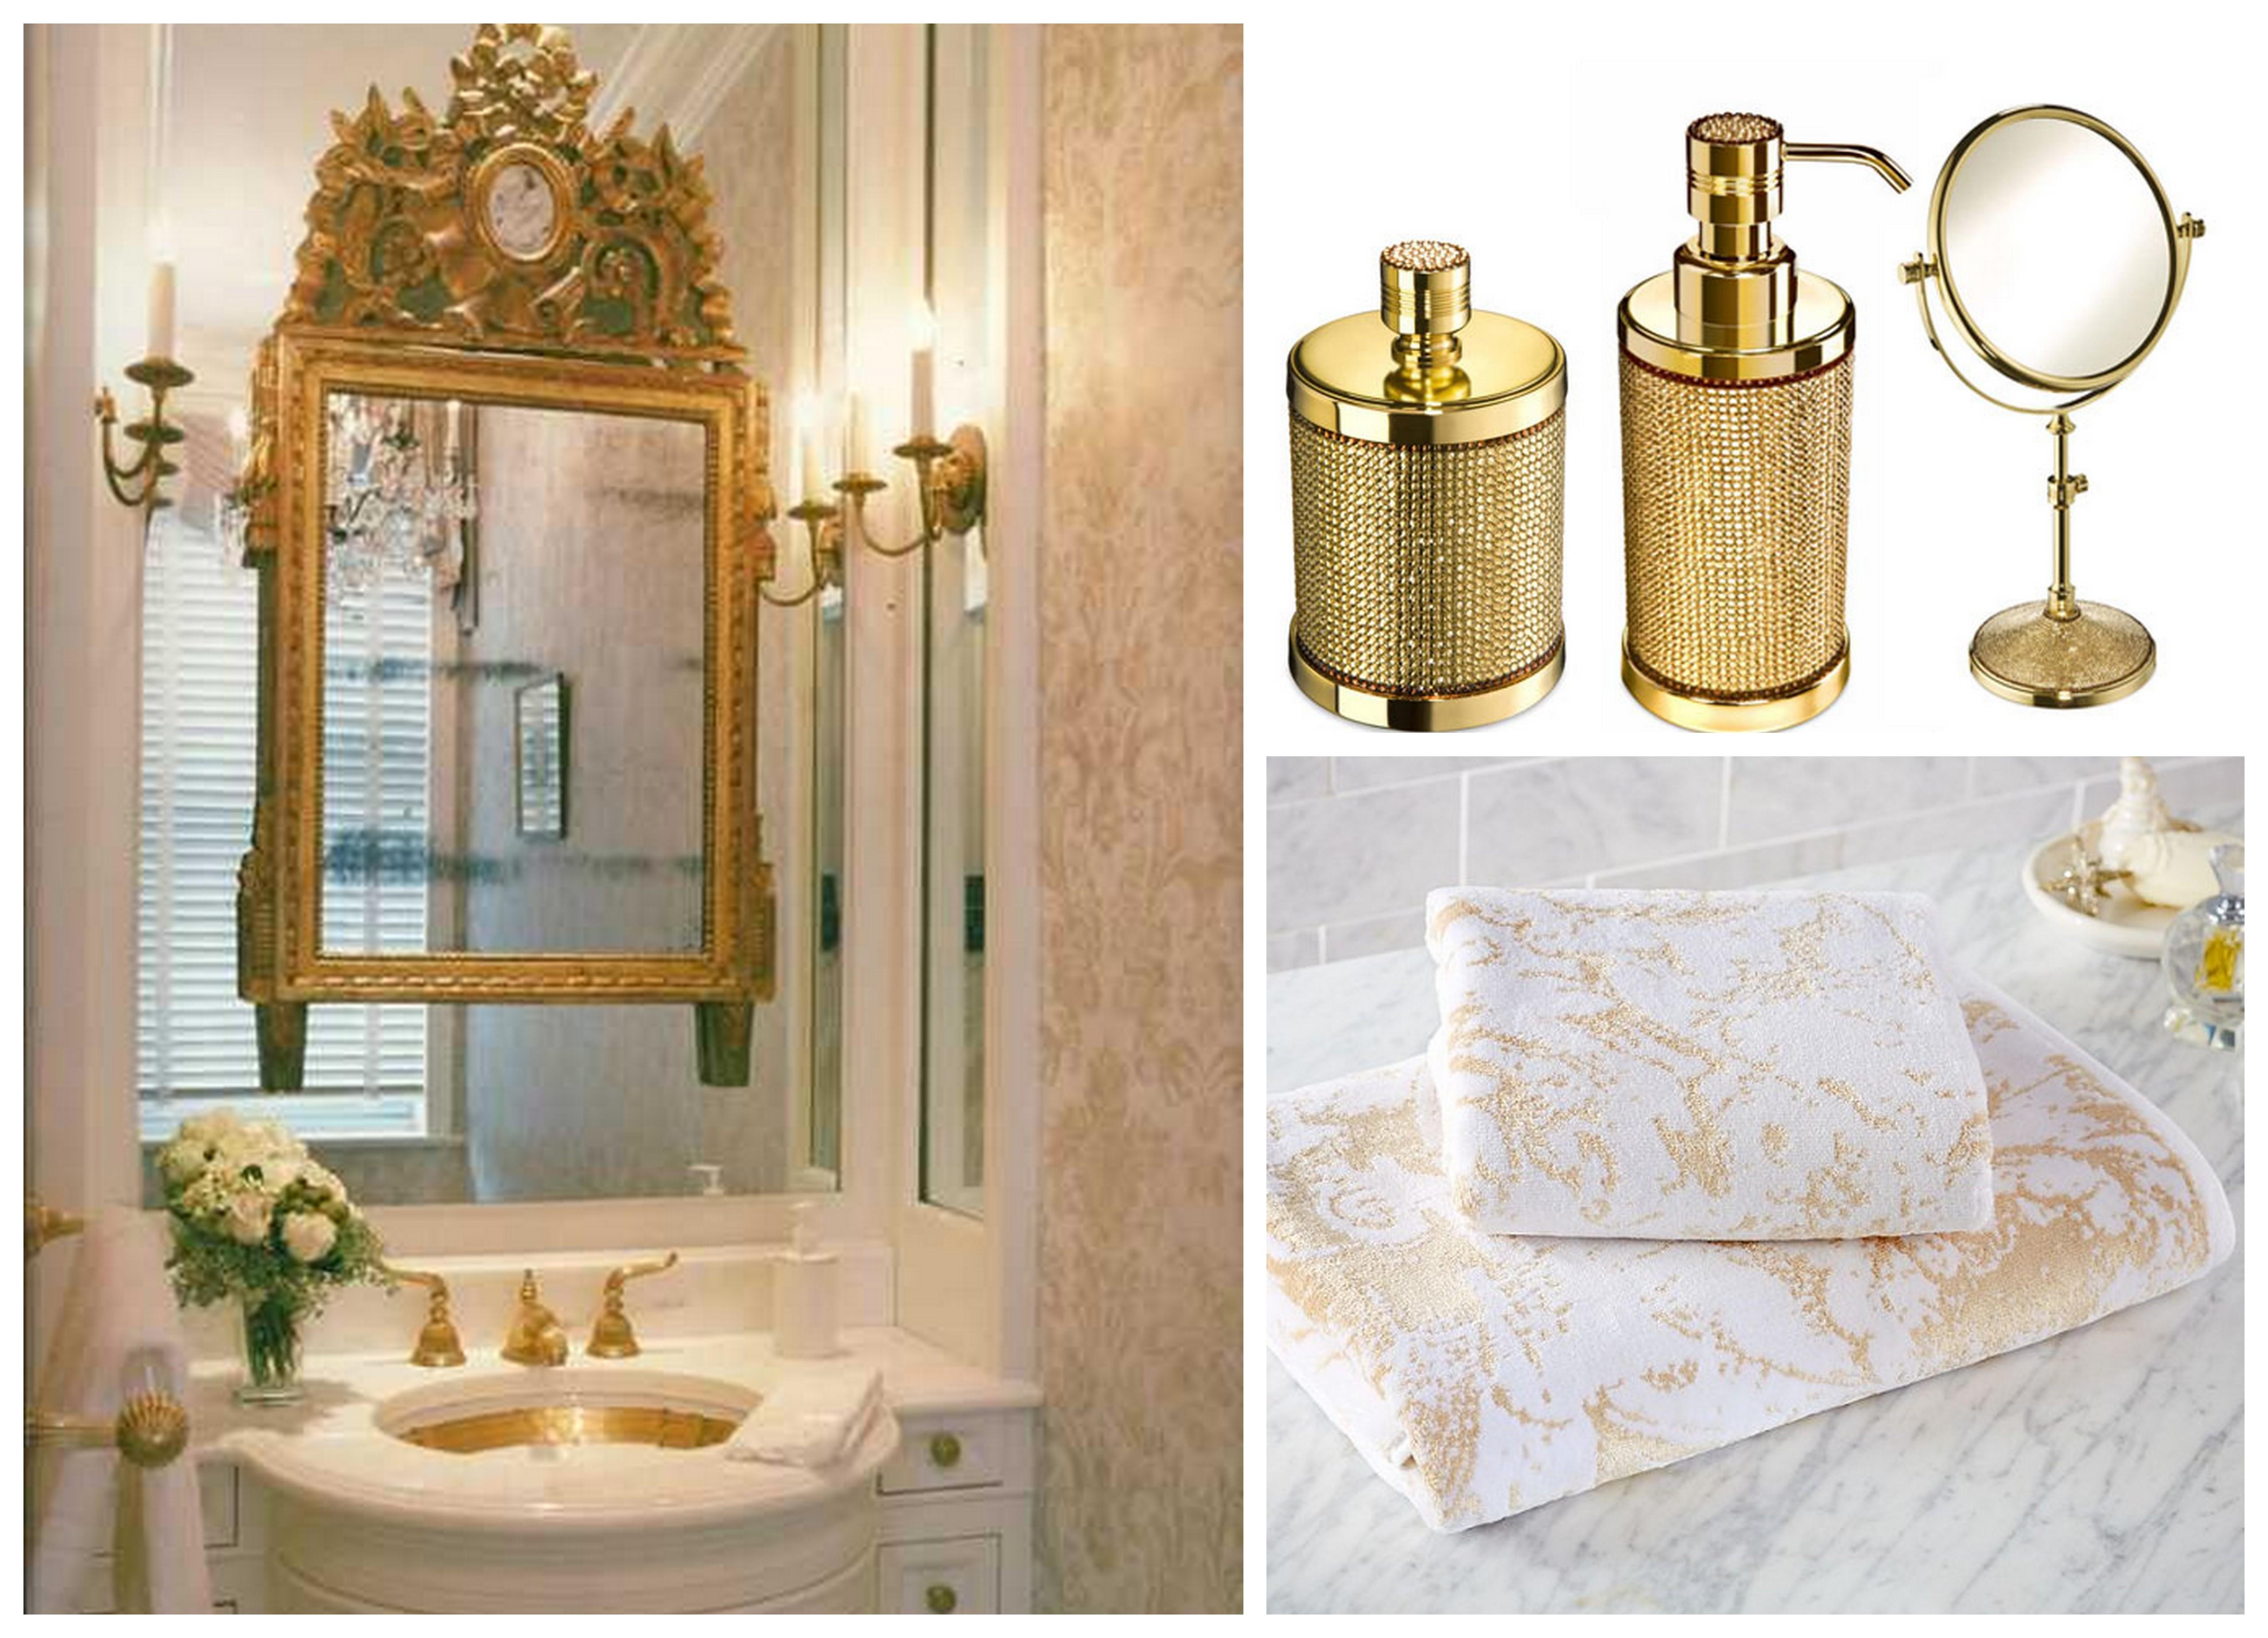 Desktop2 for Gold toilet accessories